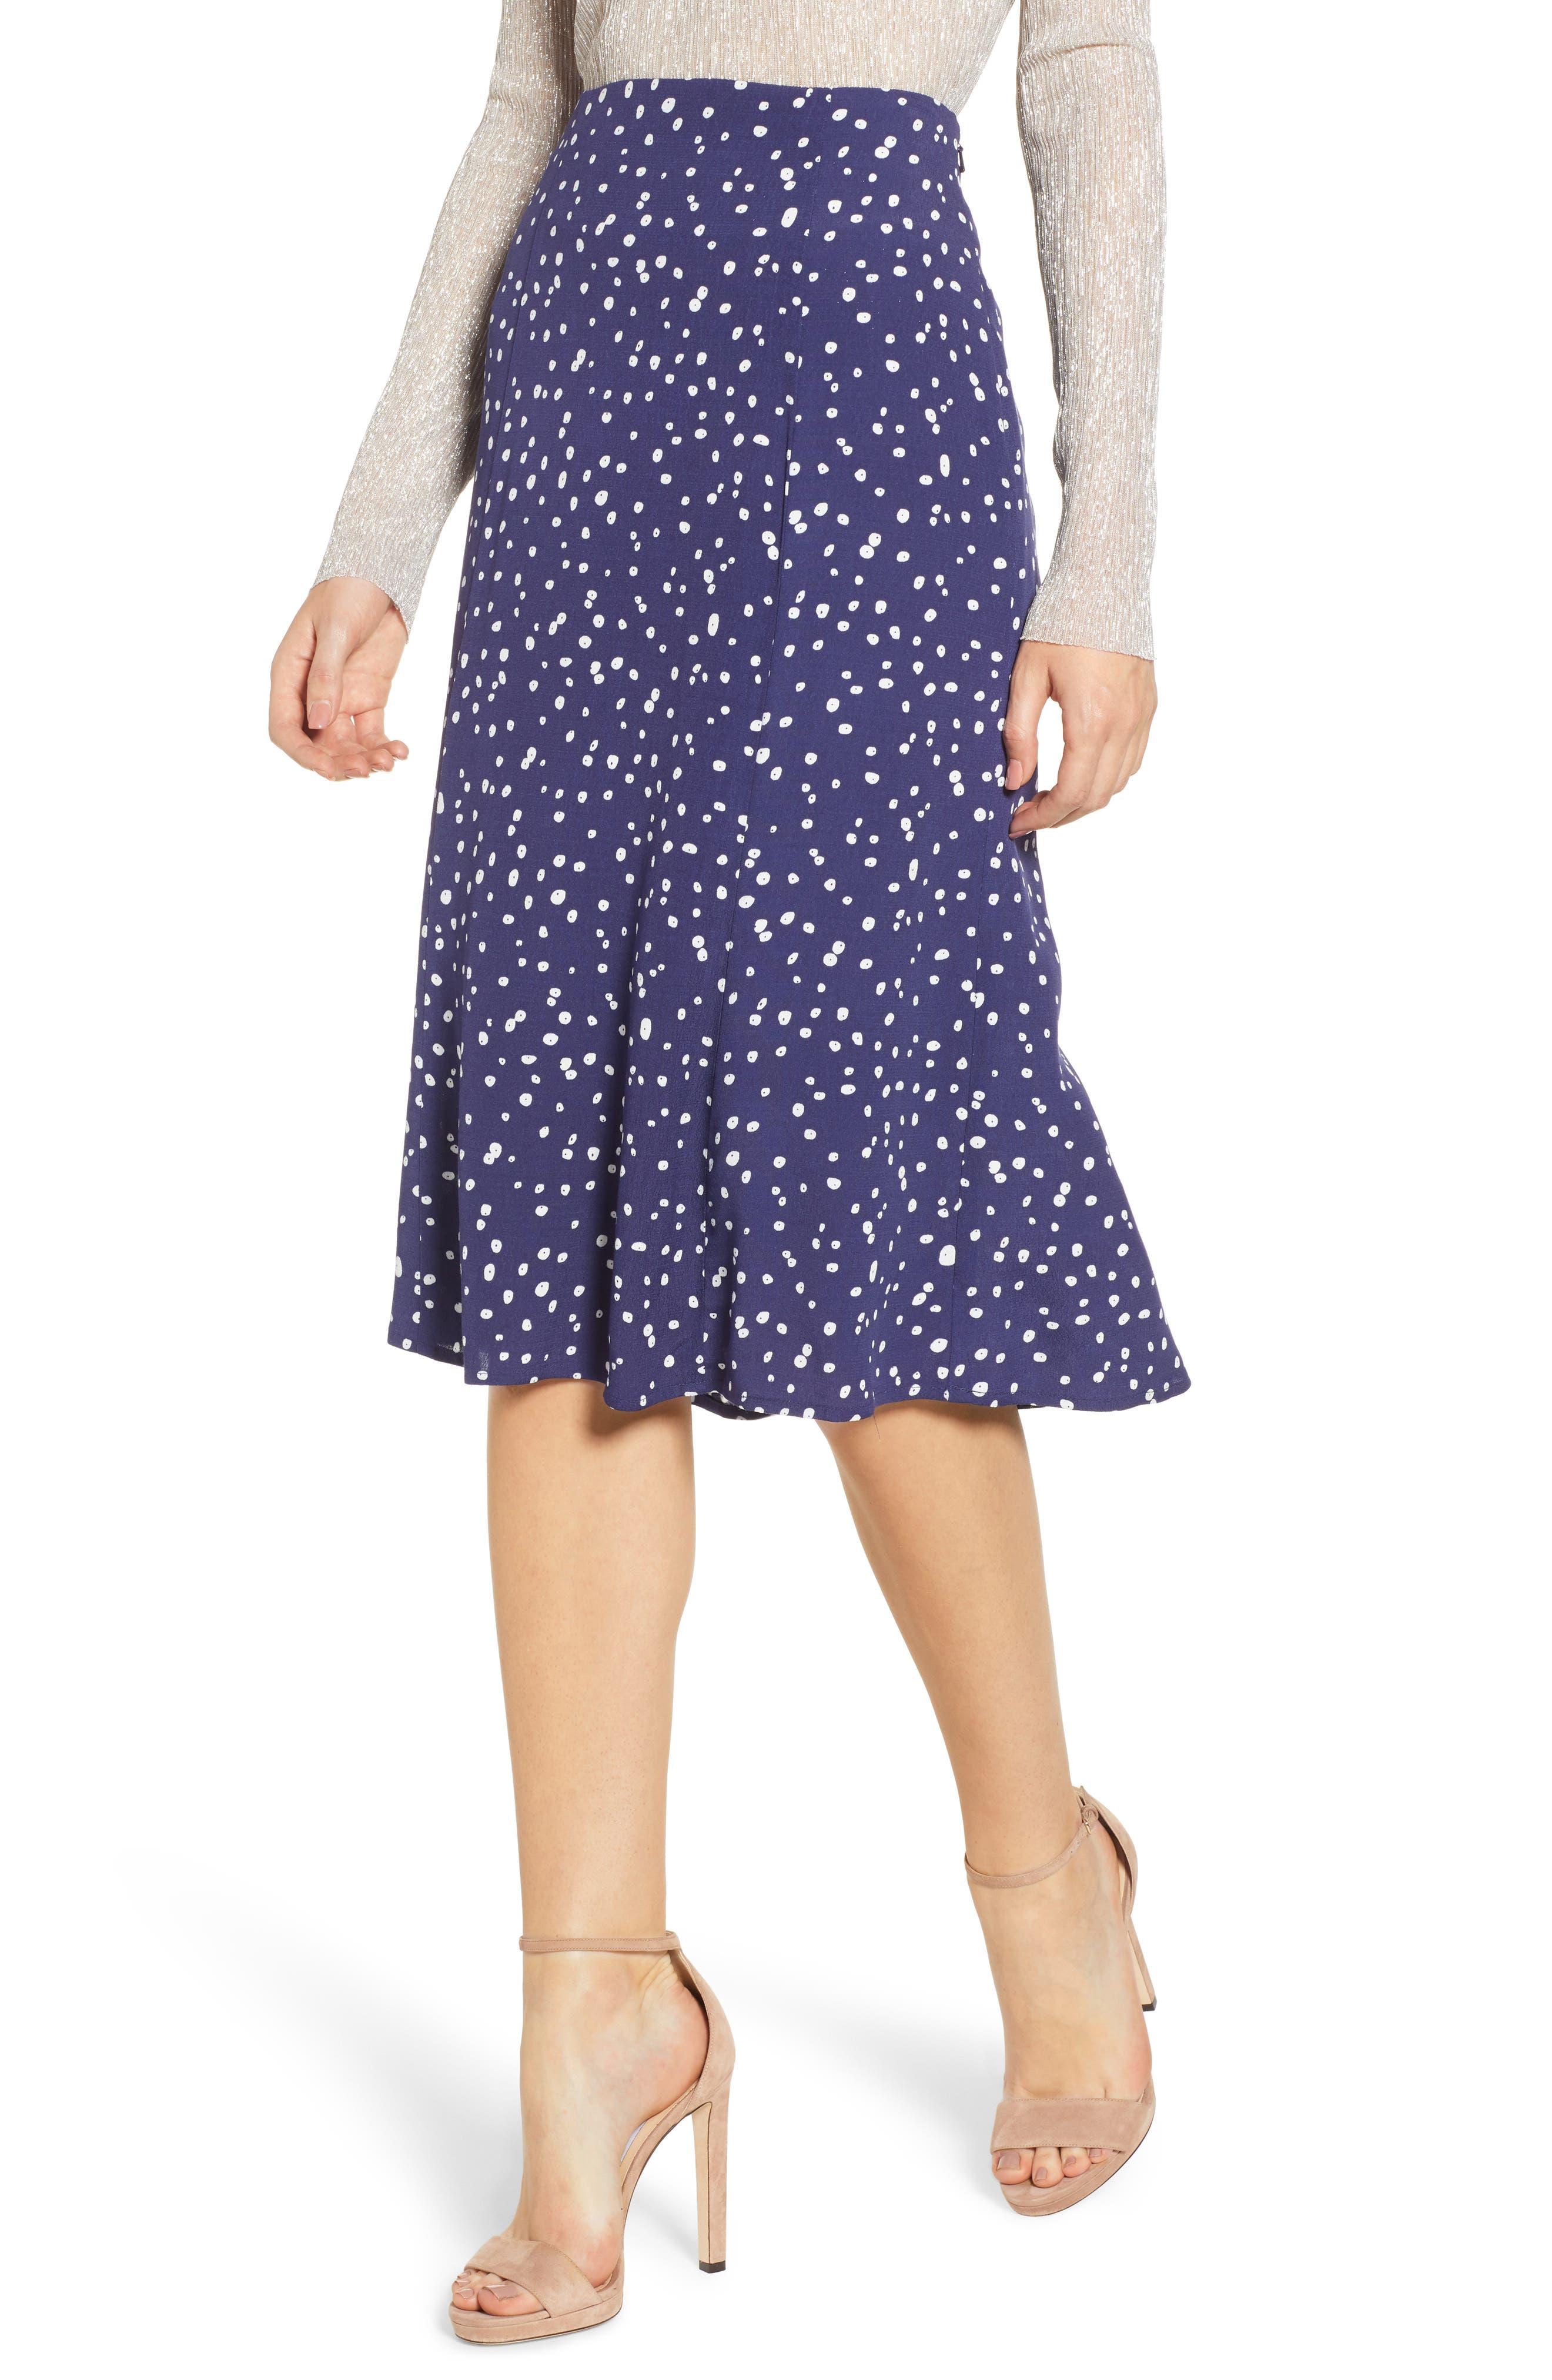 LEITH High Waist Print Midi Skirt, Main, color, NAVY PEACOAT BUTTON DOTS